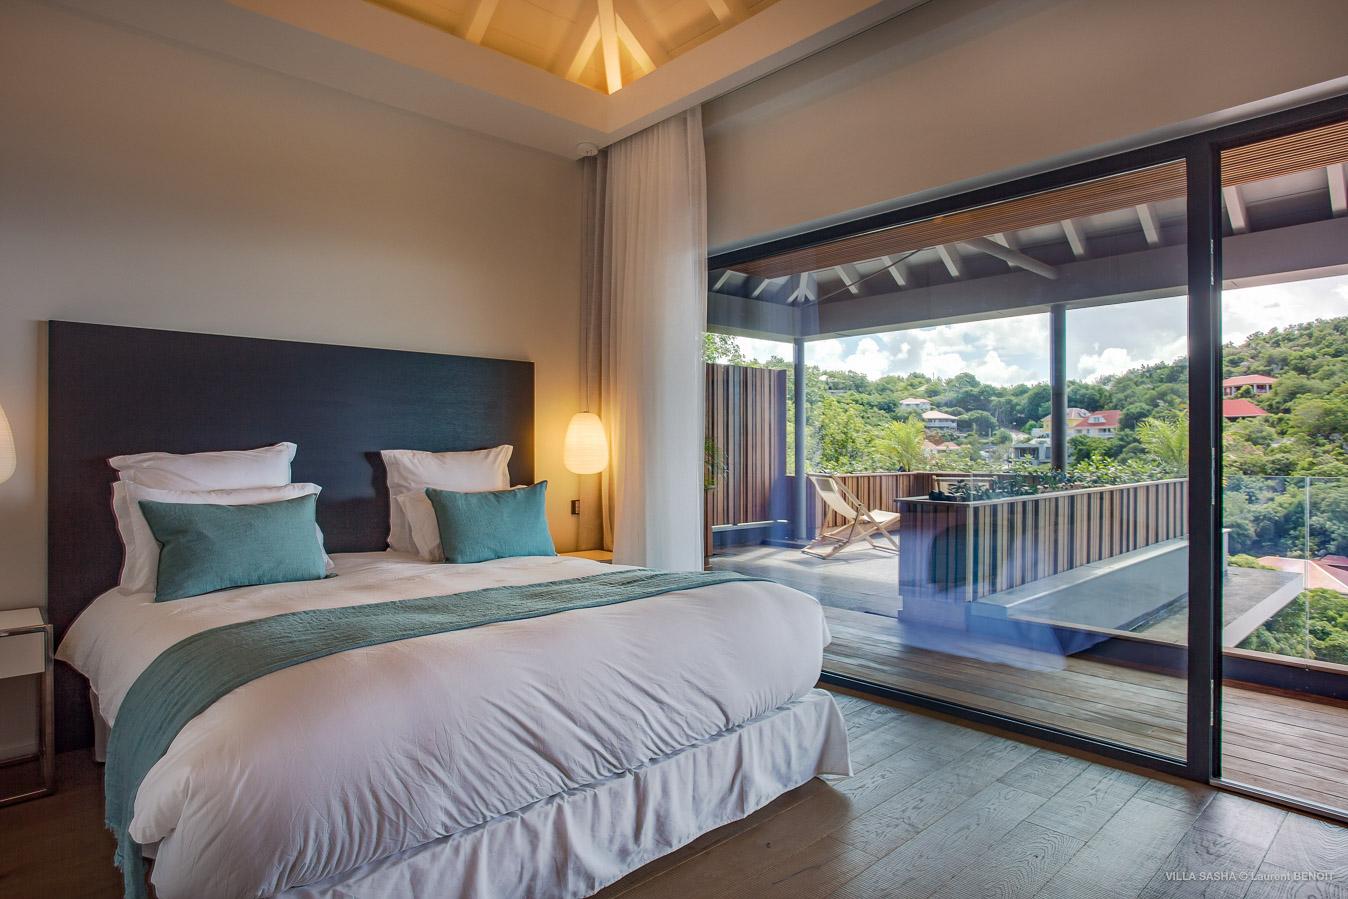 Villa Sasha - Villa for Rent with Heated Pool Corossol - Bedroom